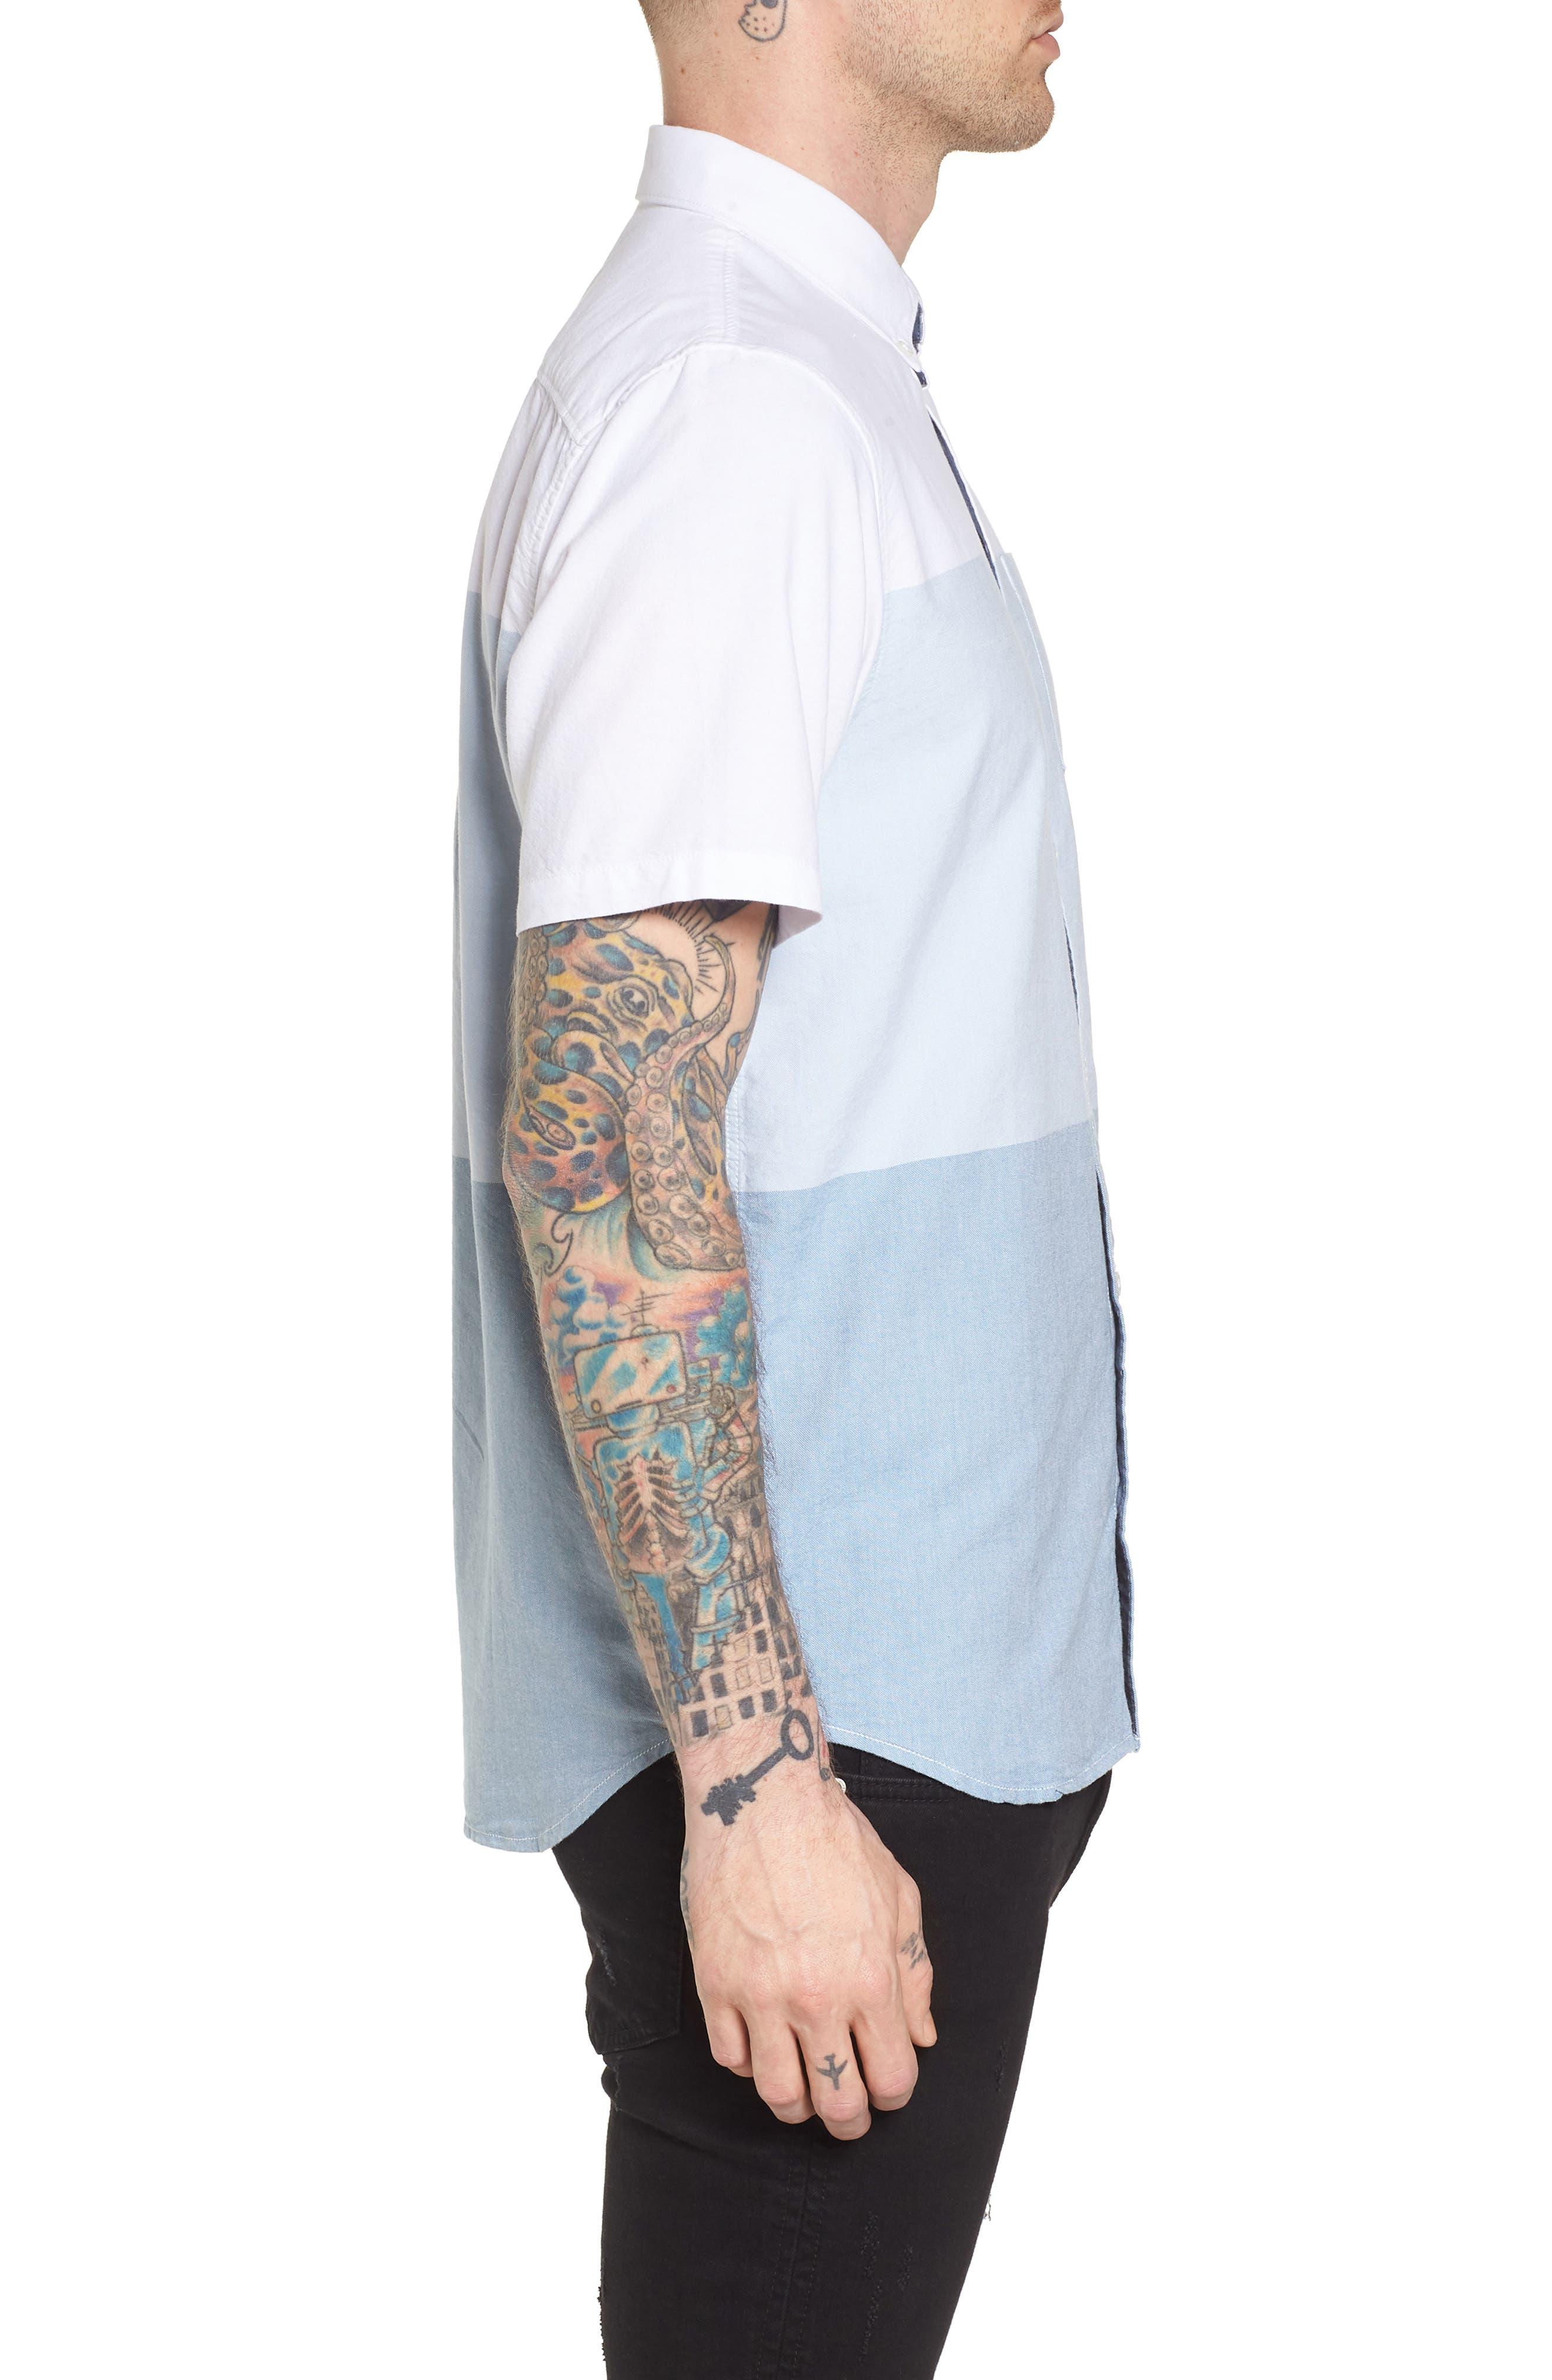 Houser Woven Shirt,                             Alternate thumbnail 4, color,                             White/ Real Teal